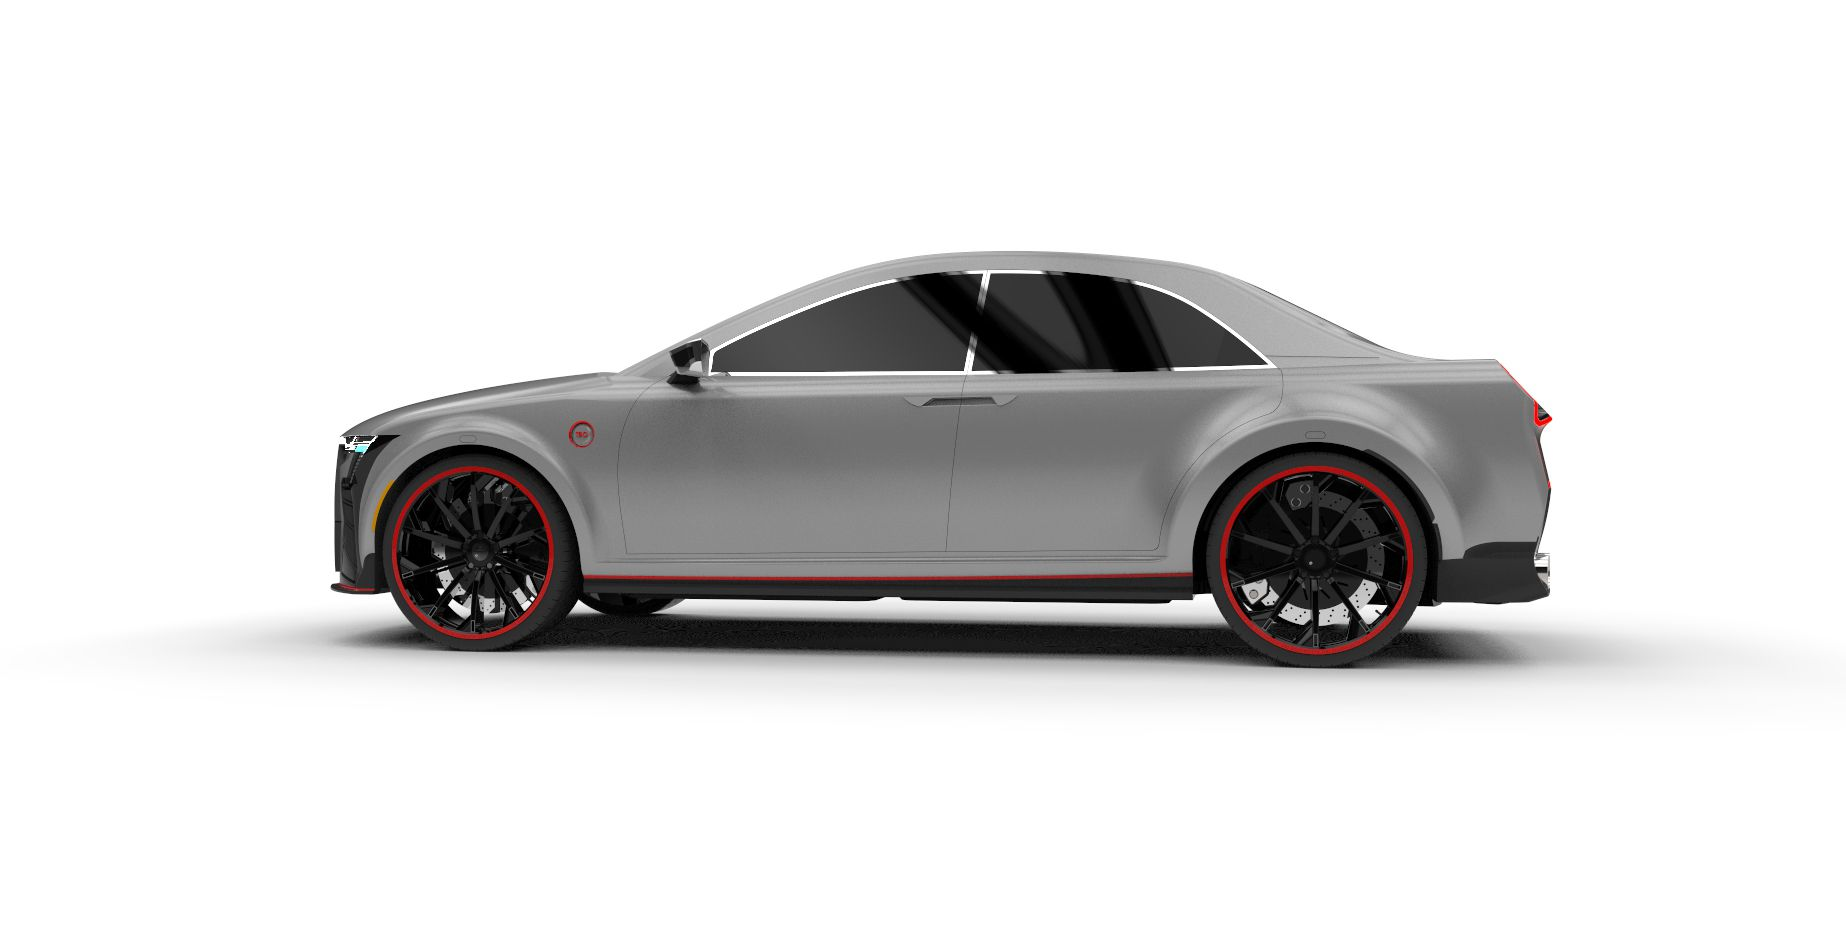 t6-2020轿车模型3D图纸 STEP格式